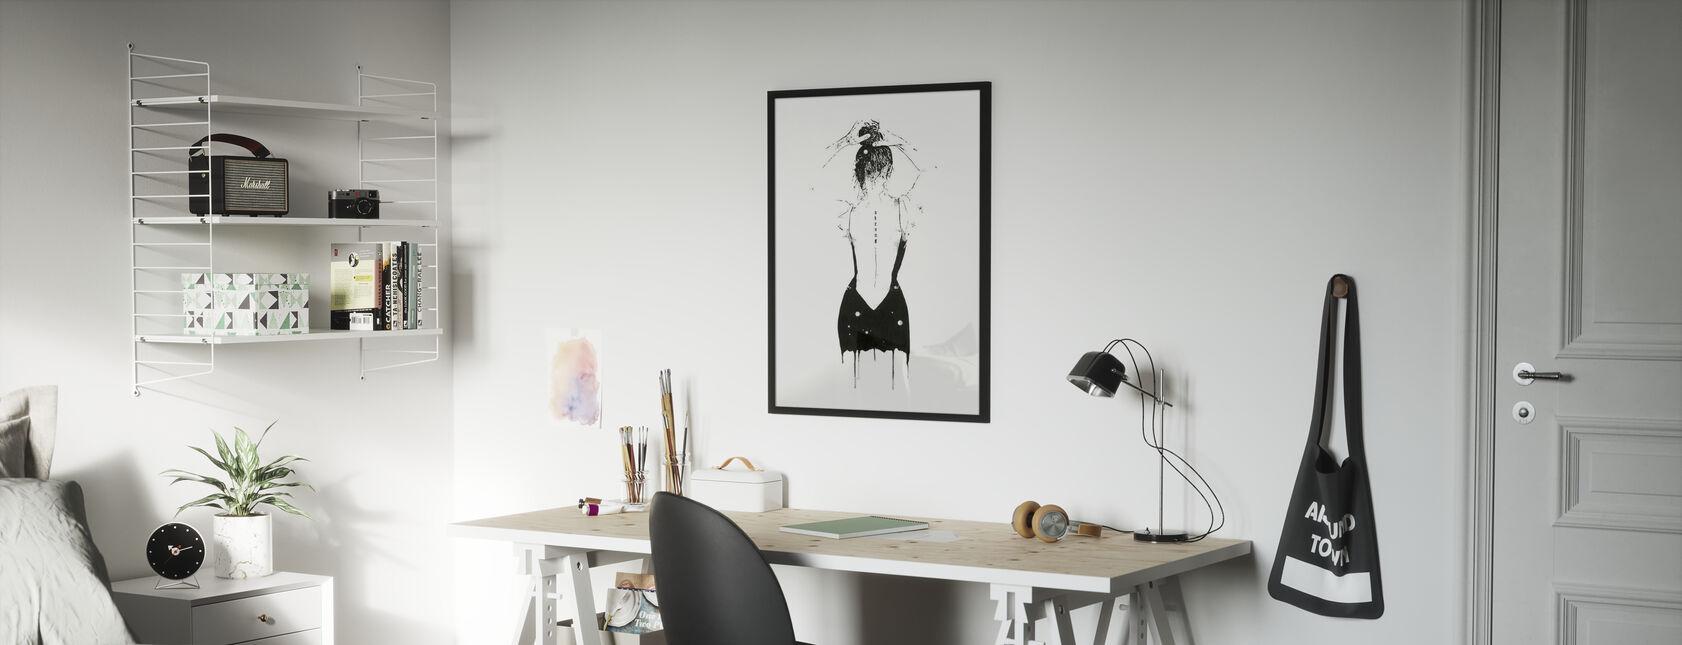 Achiever - Ingelijste print - Kinderkamer